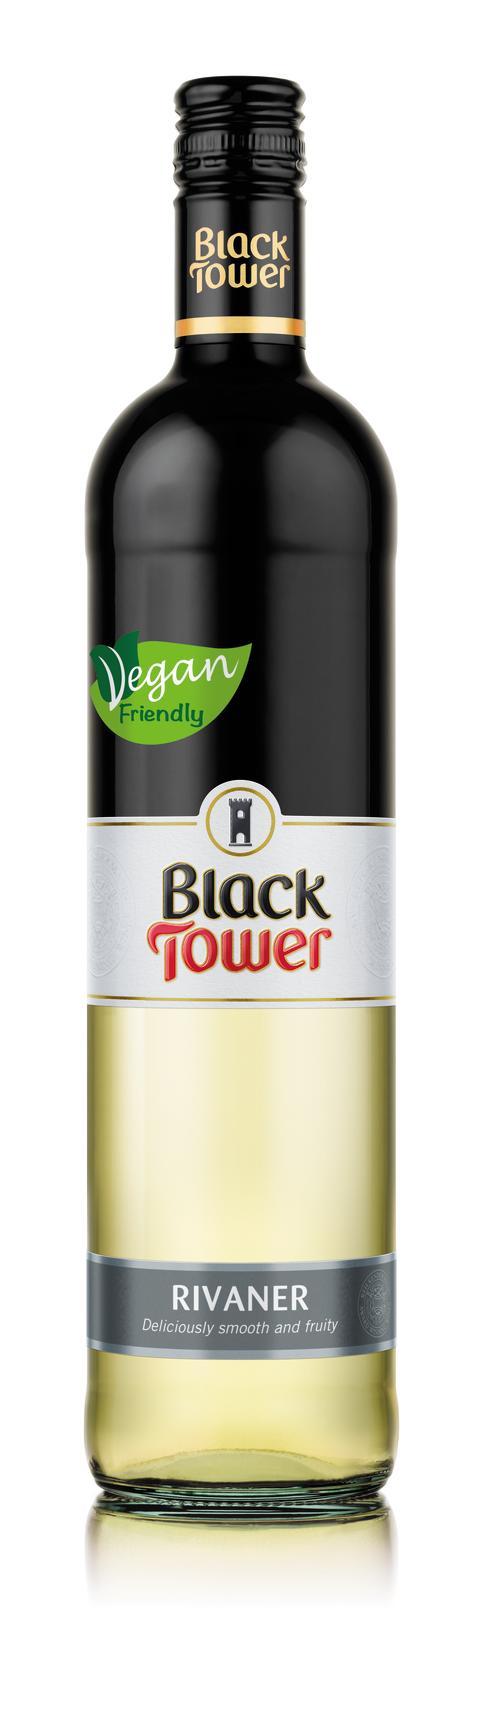 Black Tower Rivaner vegan